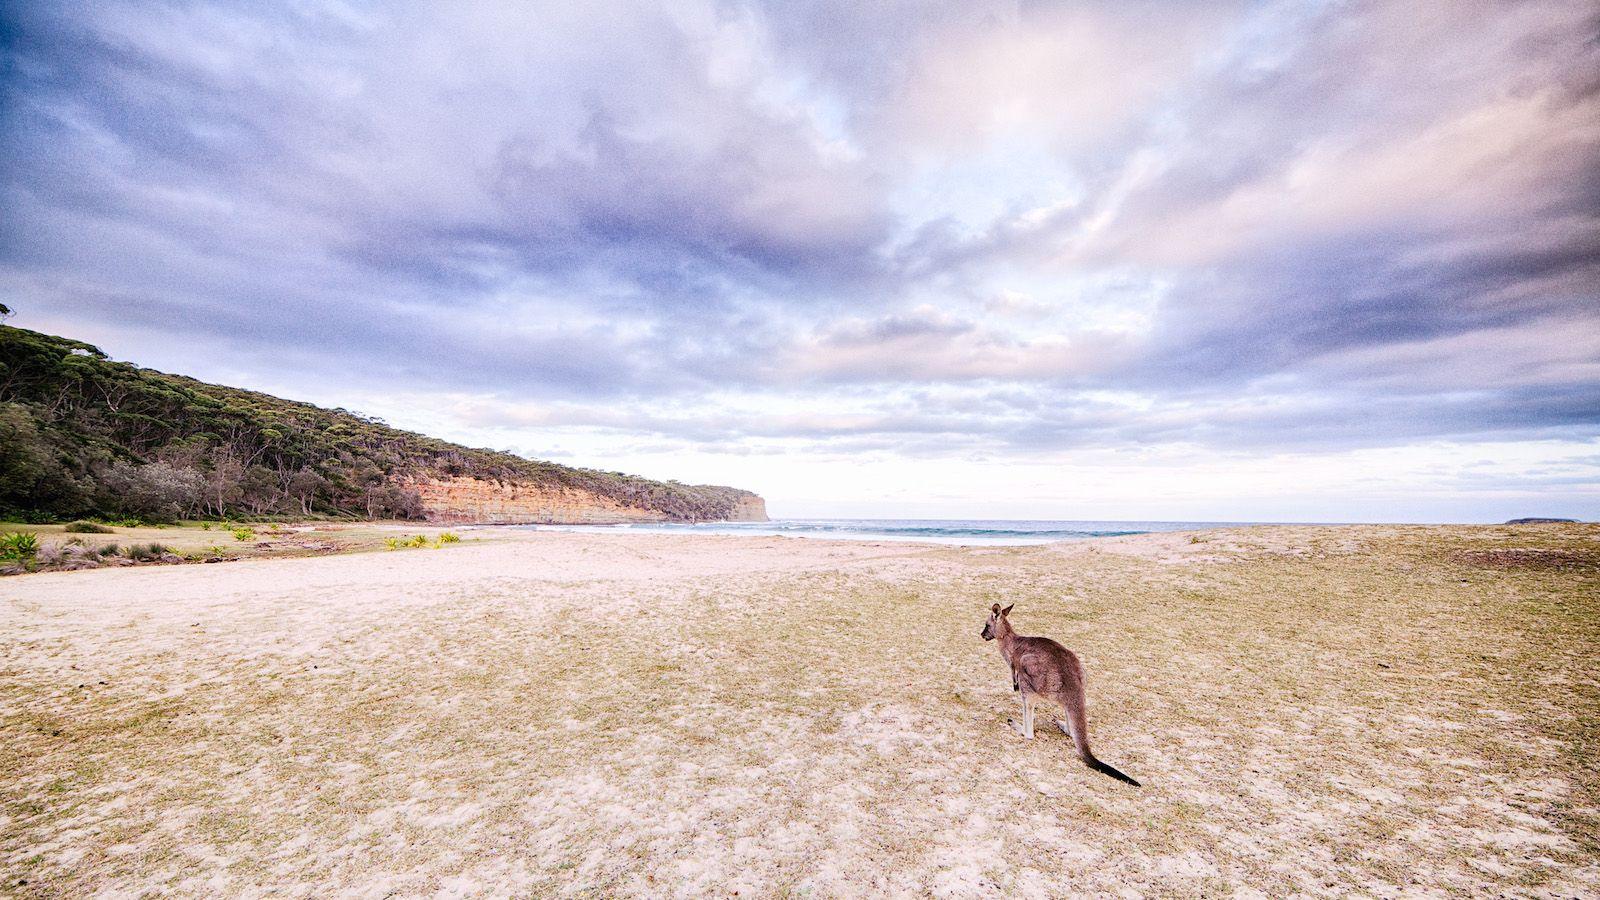 Nieuwe wandelroute op Kangaroo Island staat nu al bekend als mooiste van Australië - National Geographic Traveler Nederland/België